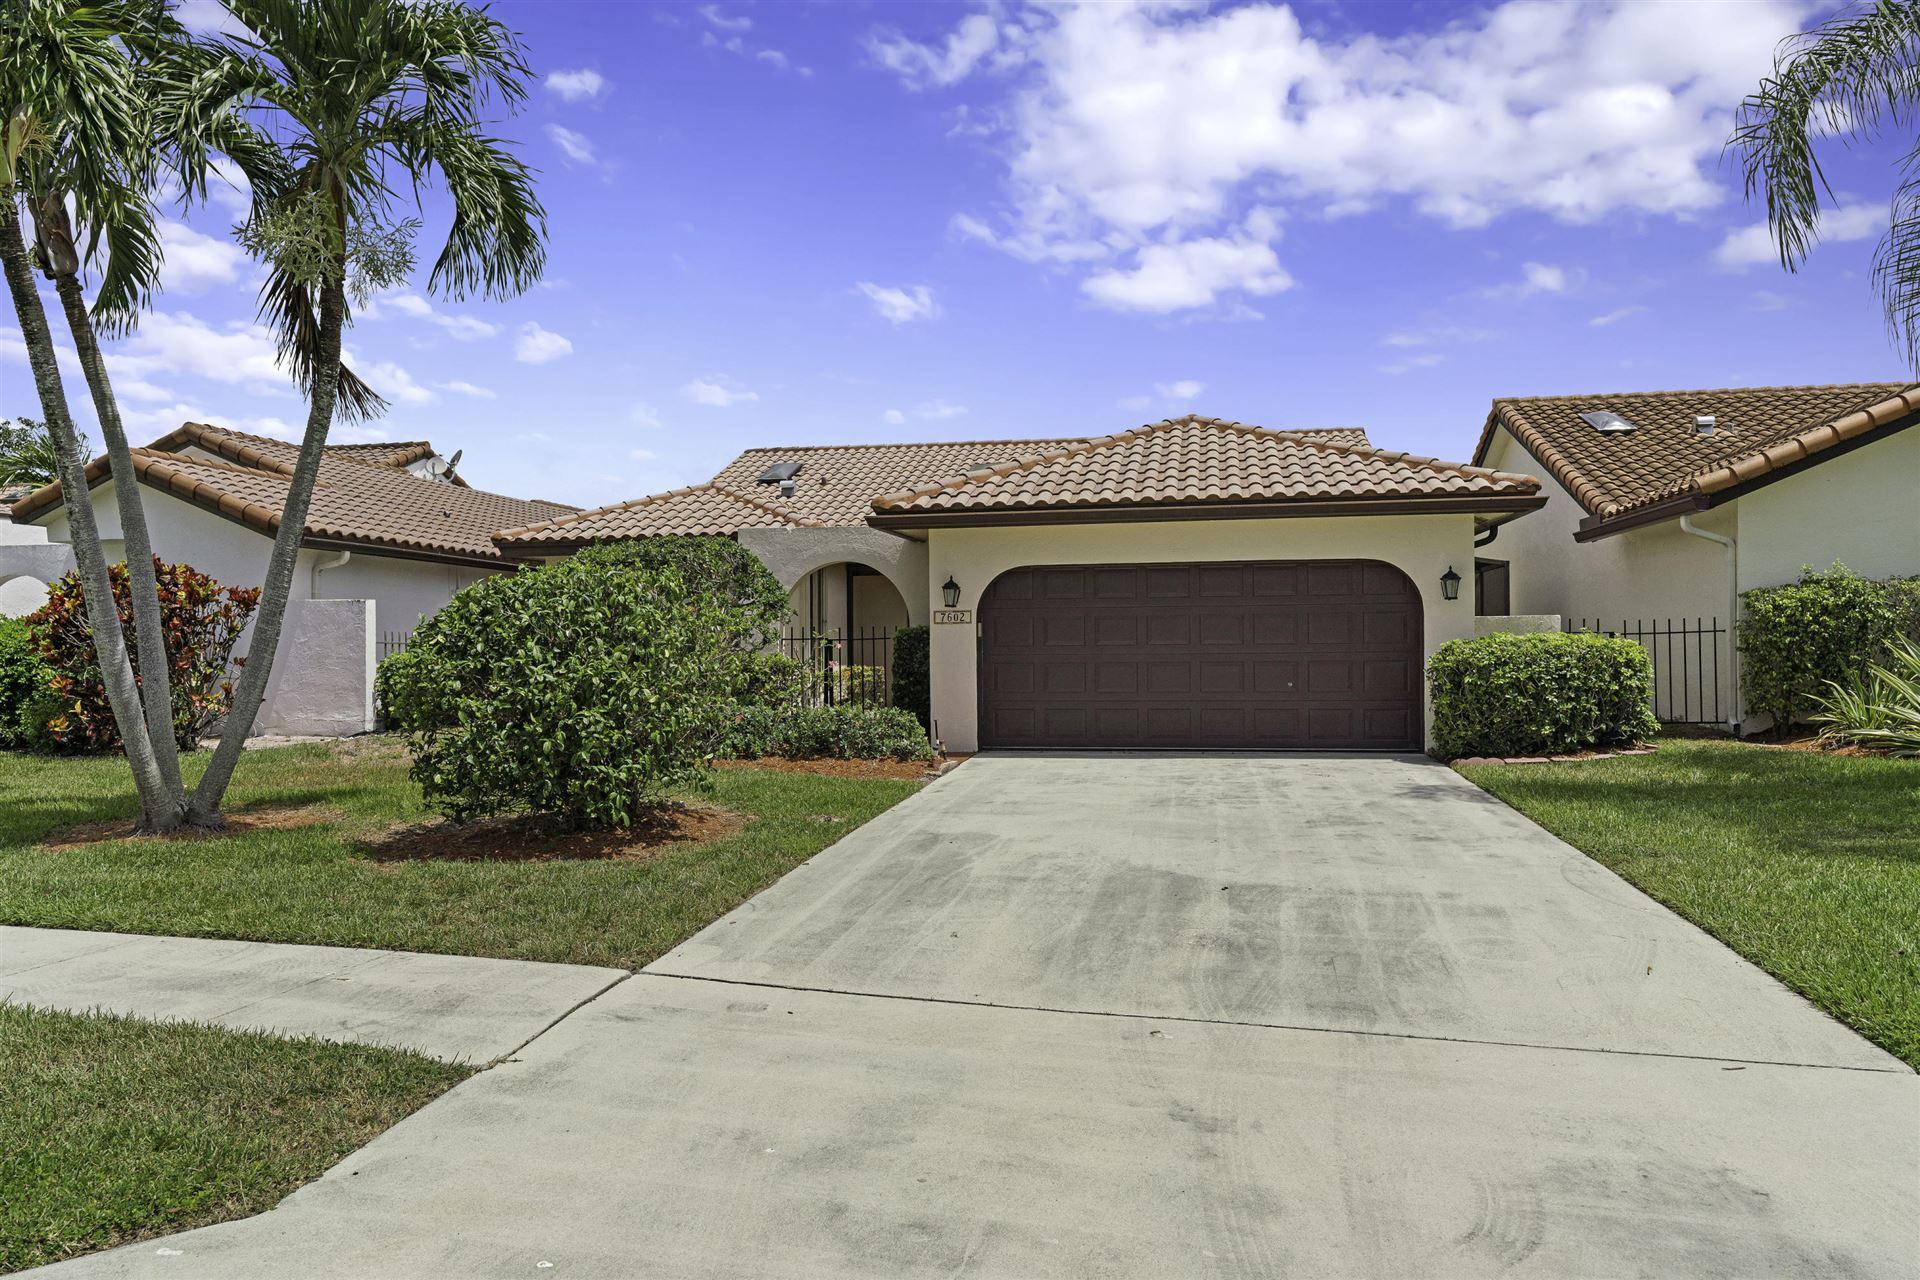 7602 Solimar Circle, Boca Raton, FL 33433 - #: RX-10637007